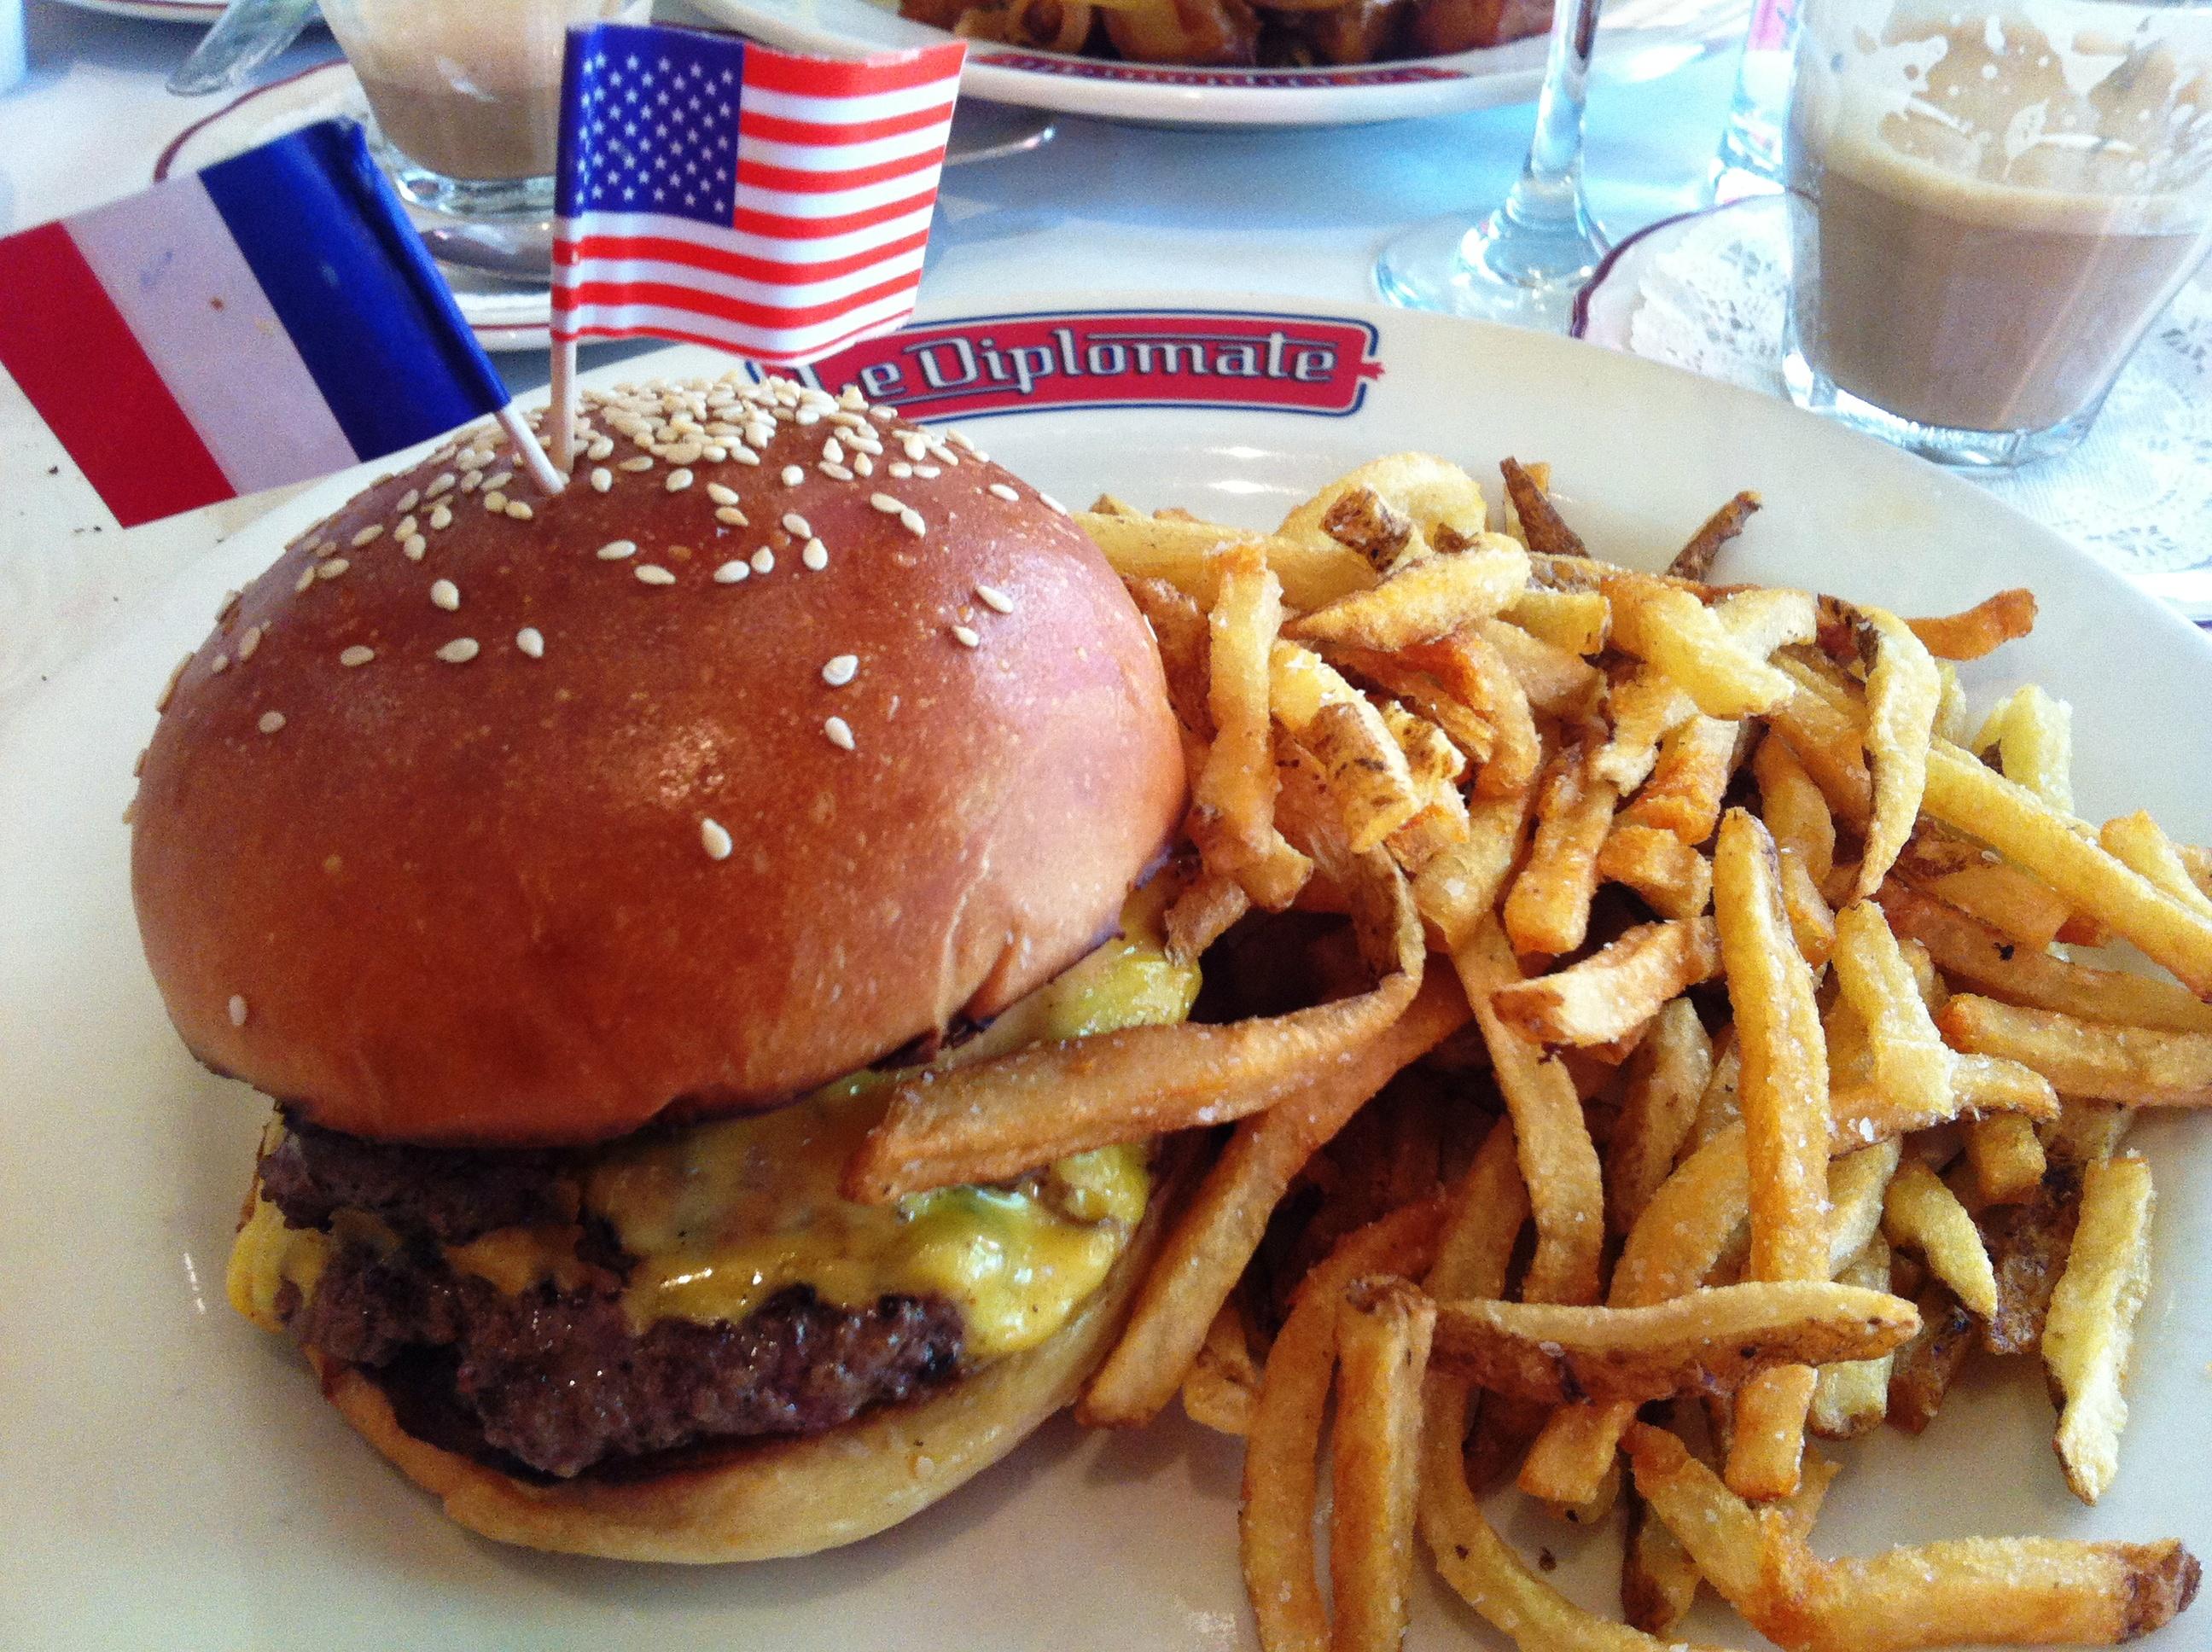 Burger Americain at Le Diplomate (Photo: Lanna Nguyen/DC on Heels)